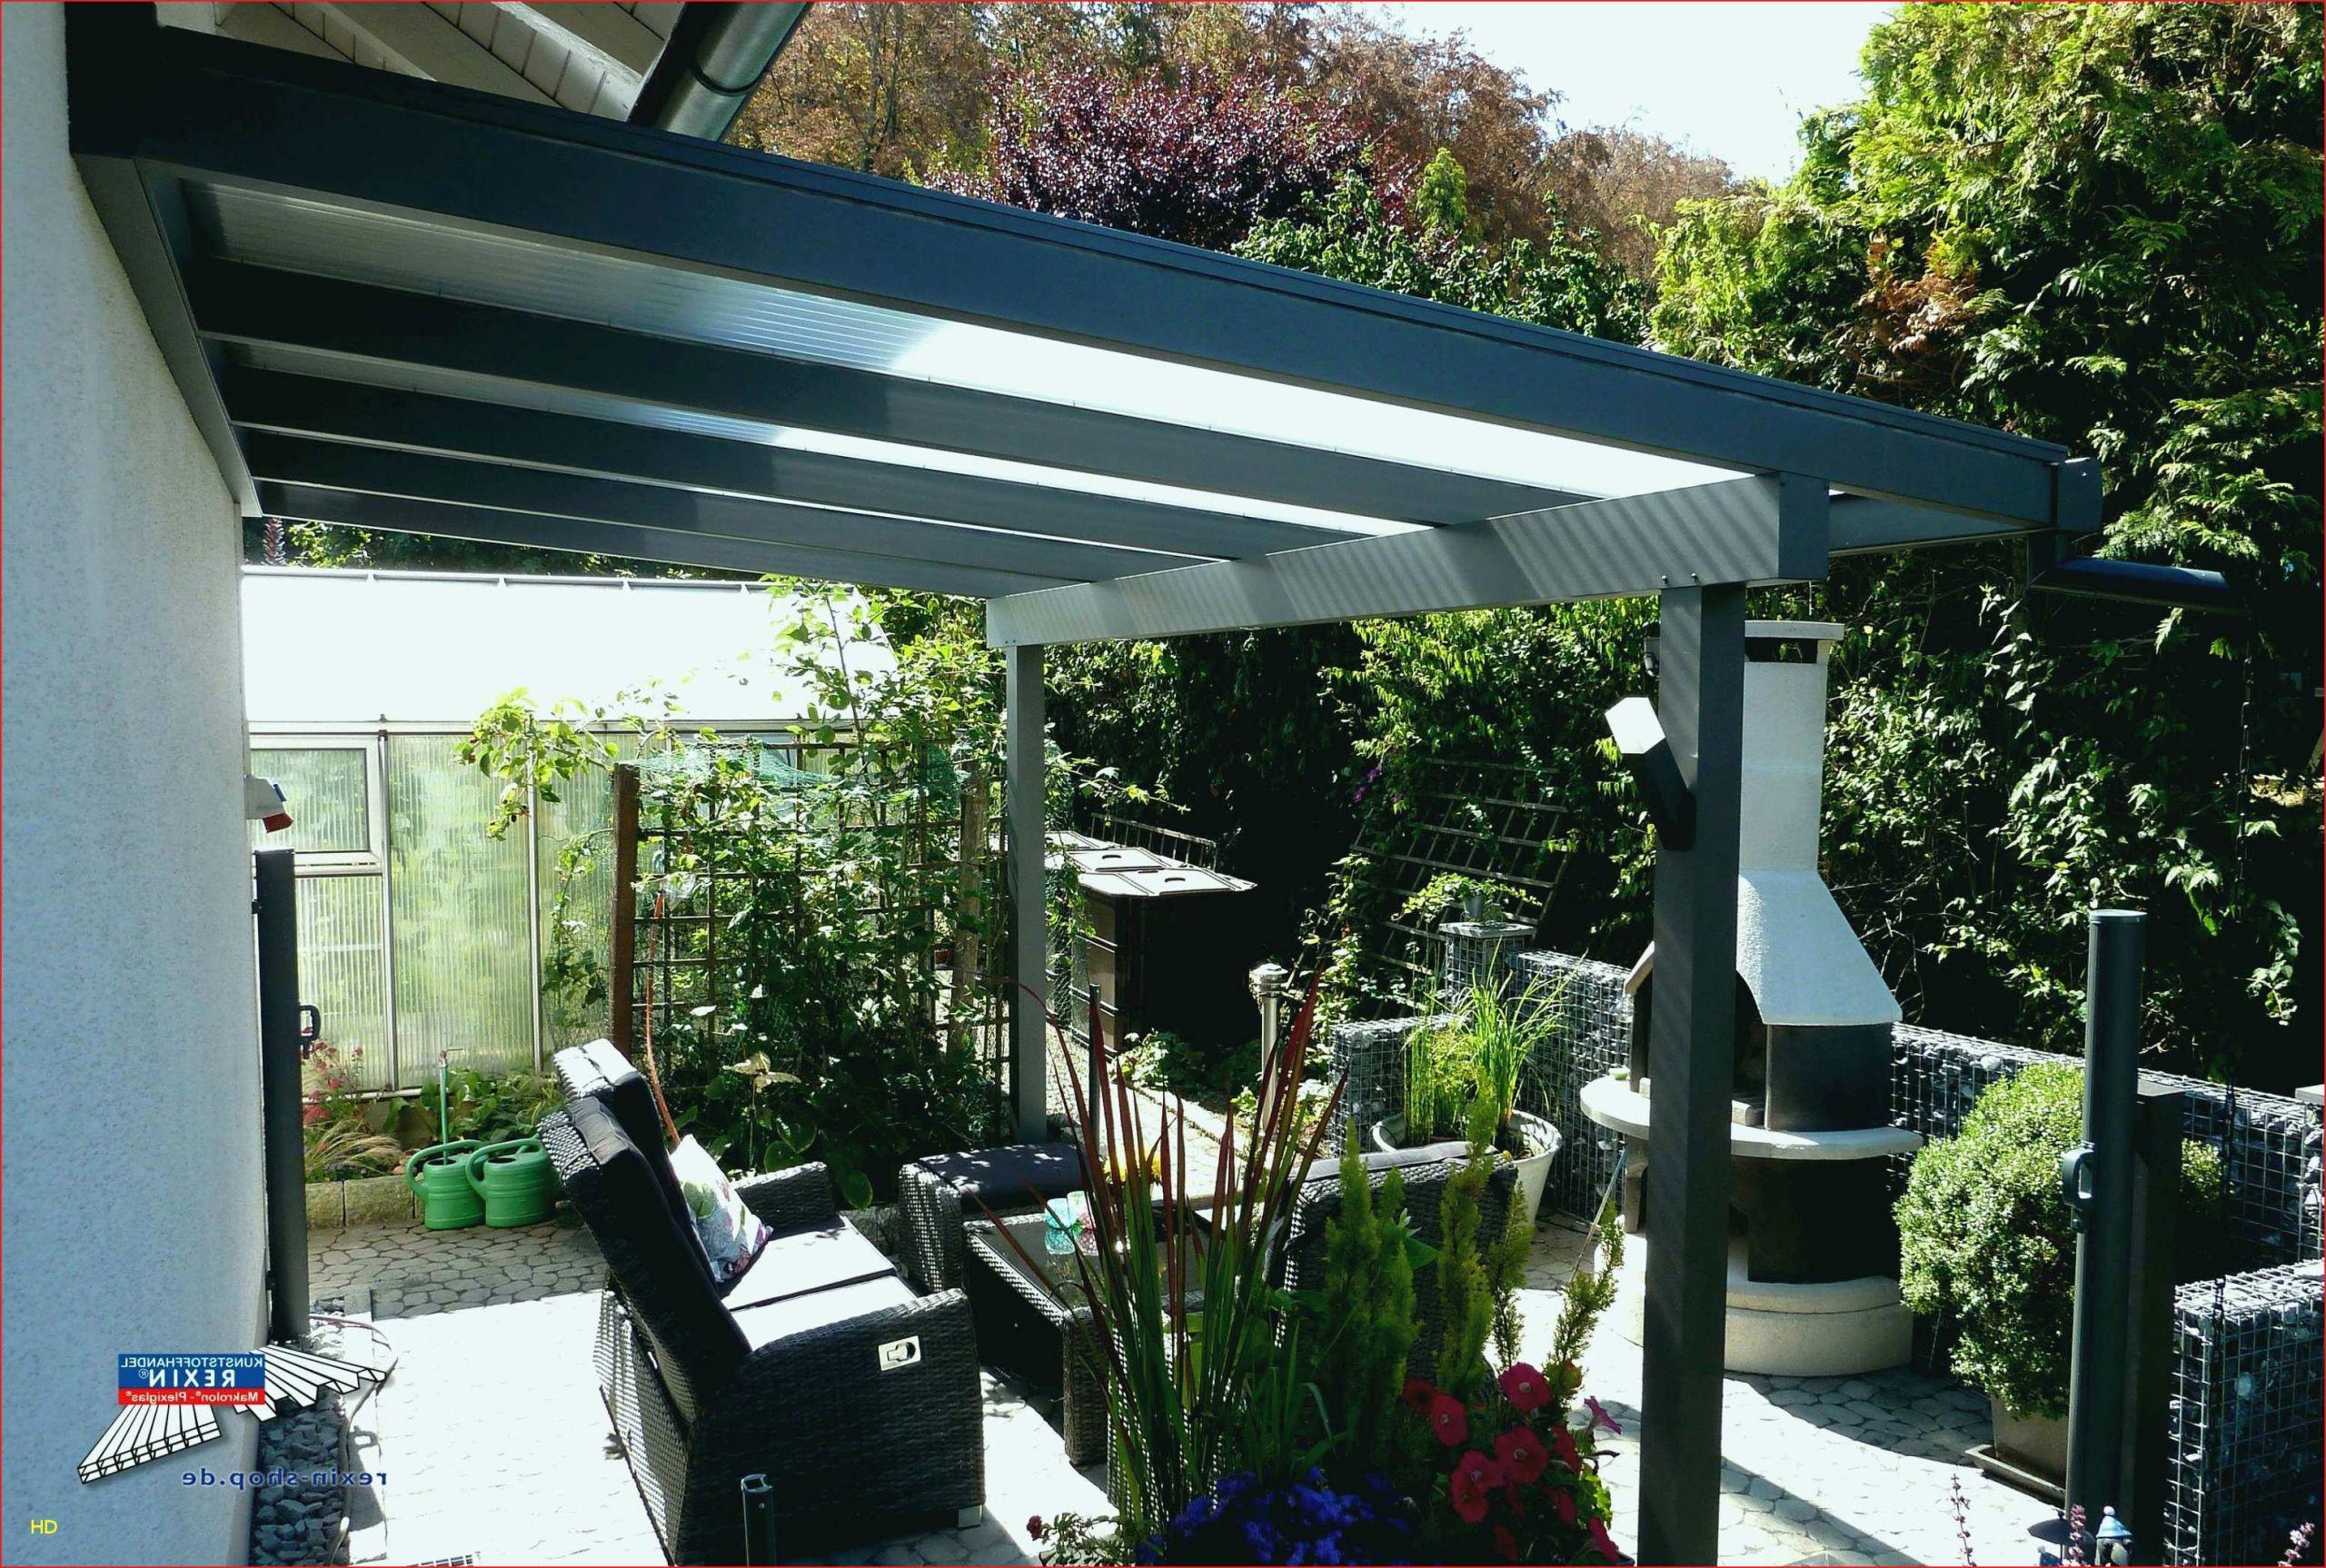 photo veranda gartenhaus mit veranda sch n idee deco veranda unique unique plafond of photo veranda